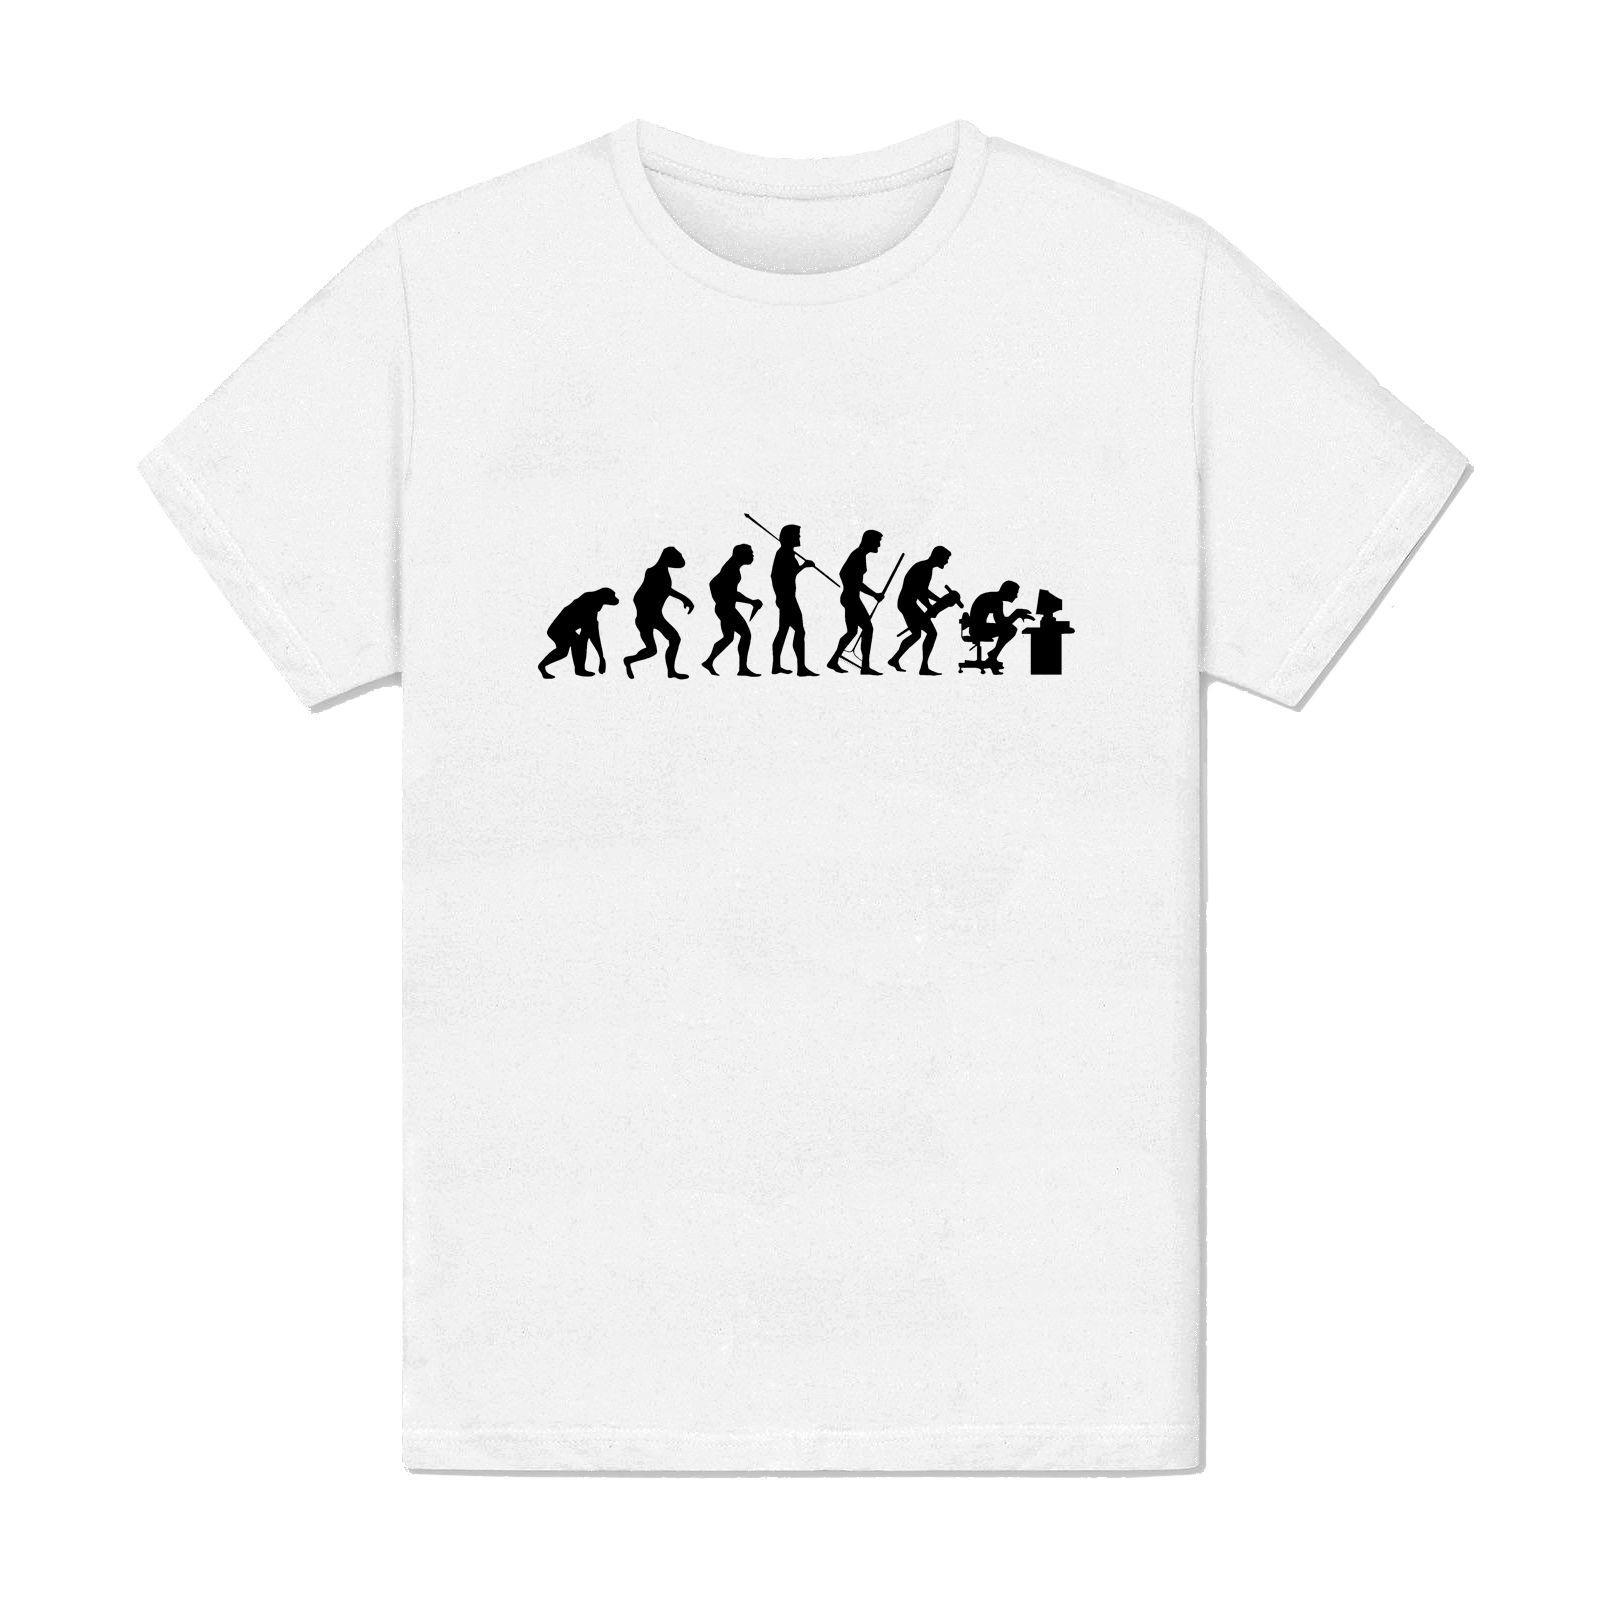 Grosshandel T Shirt Manner Weiss Evolutionary Computer Science